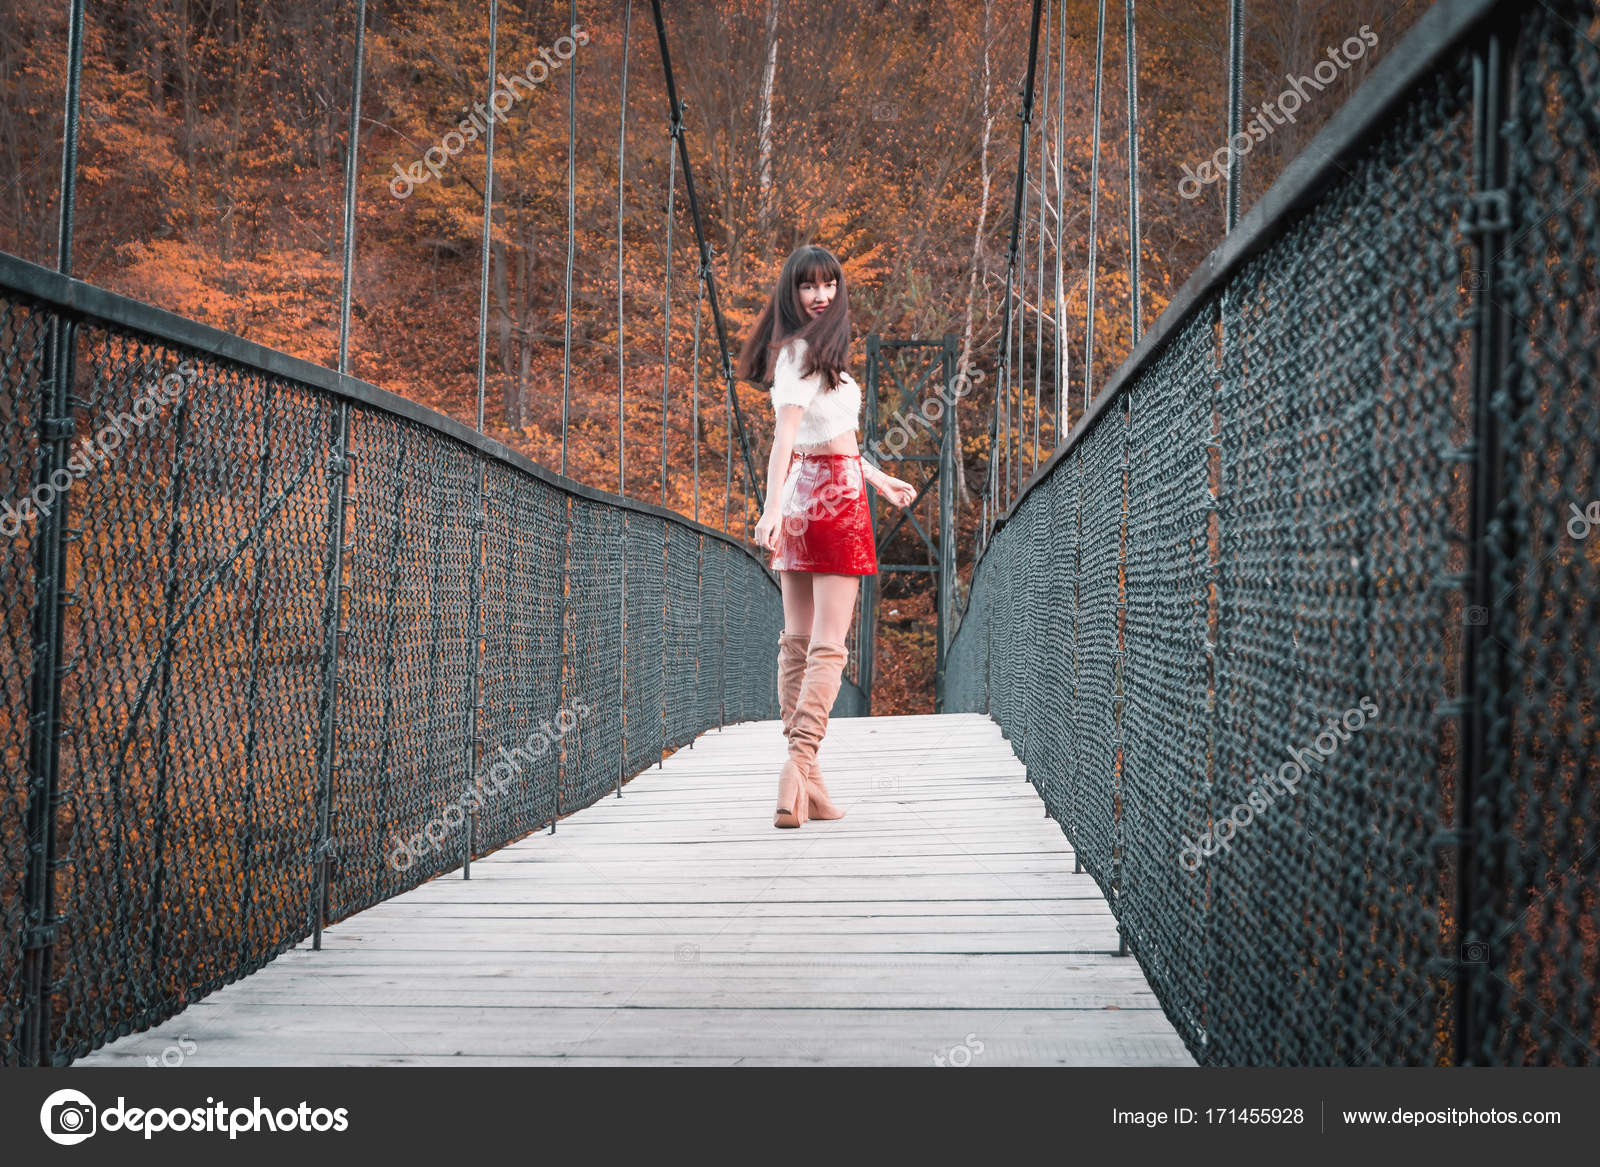 2299c0ed86a Όμορφη Καυκάσιος Ευρωπαϊκή κορίτσι με κόκκινη φούστα, ψηλές μπότες και  λευκό πάνω σε μια γέφυρα